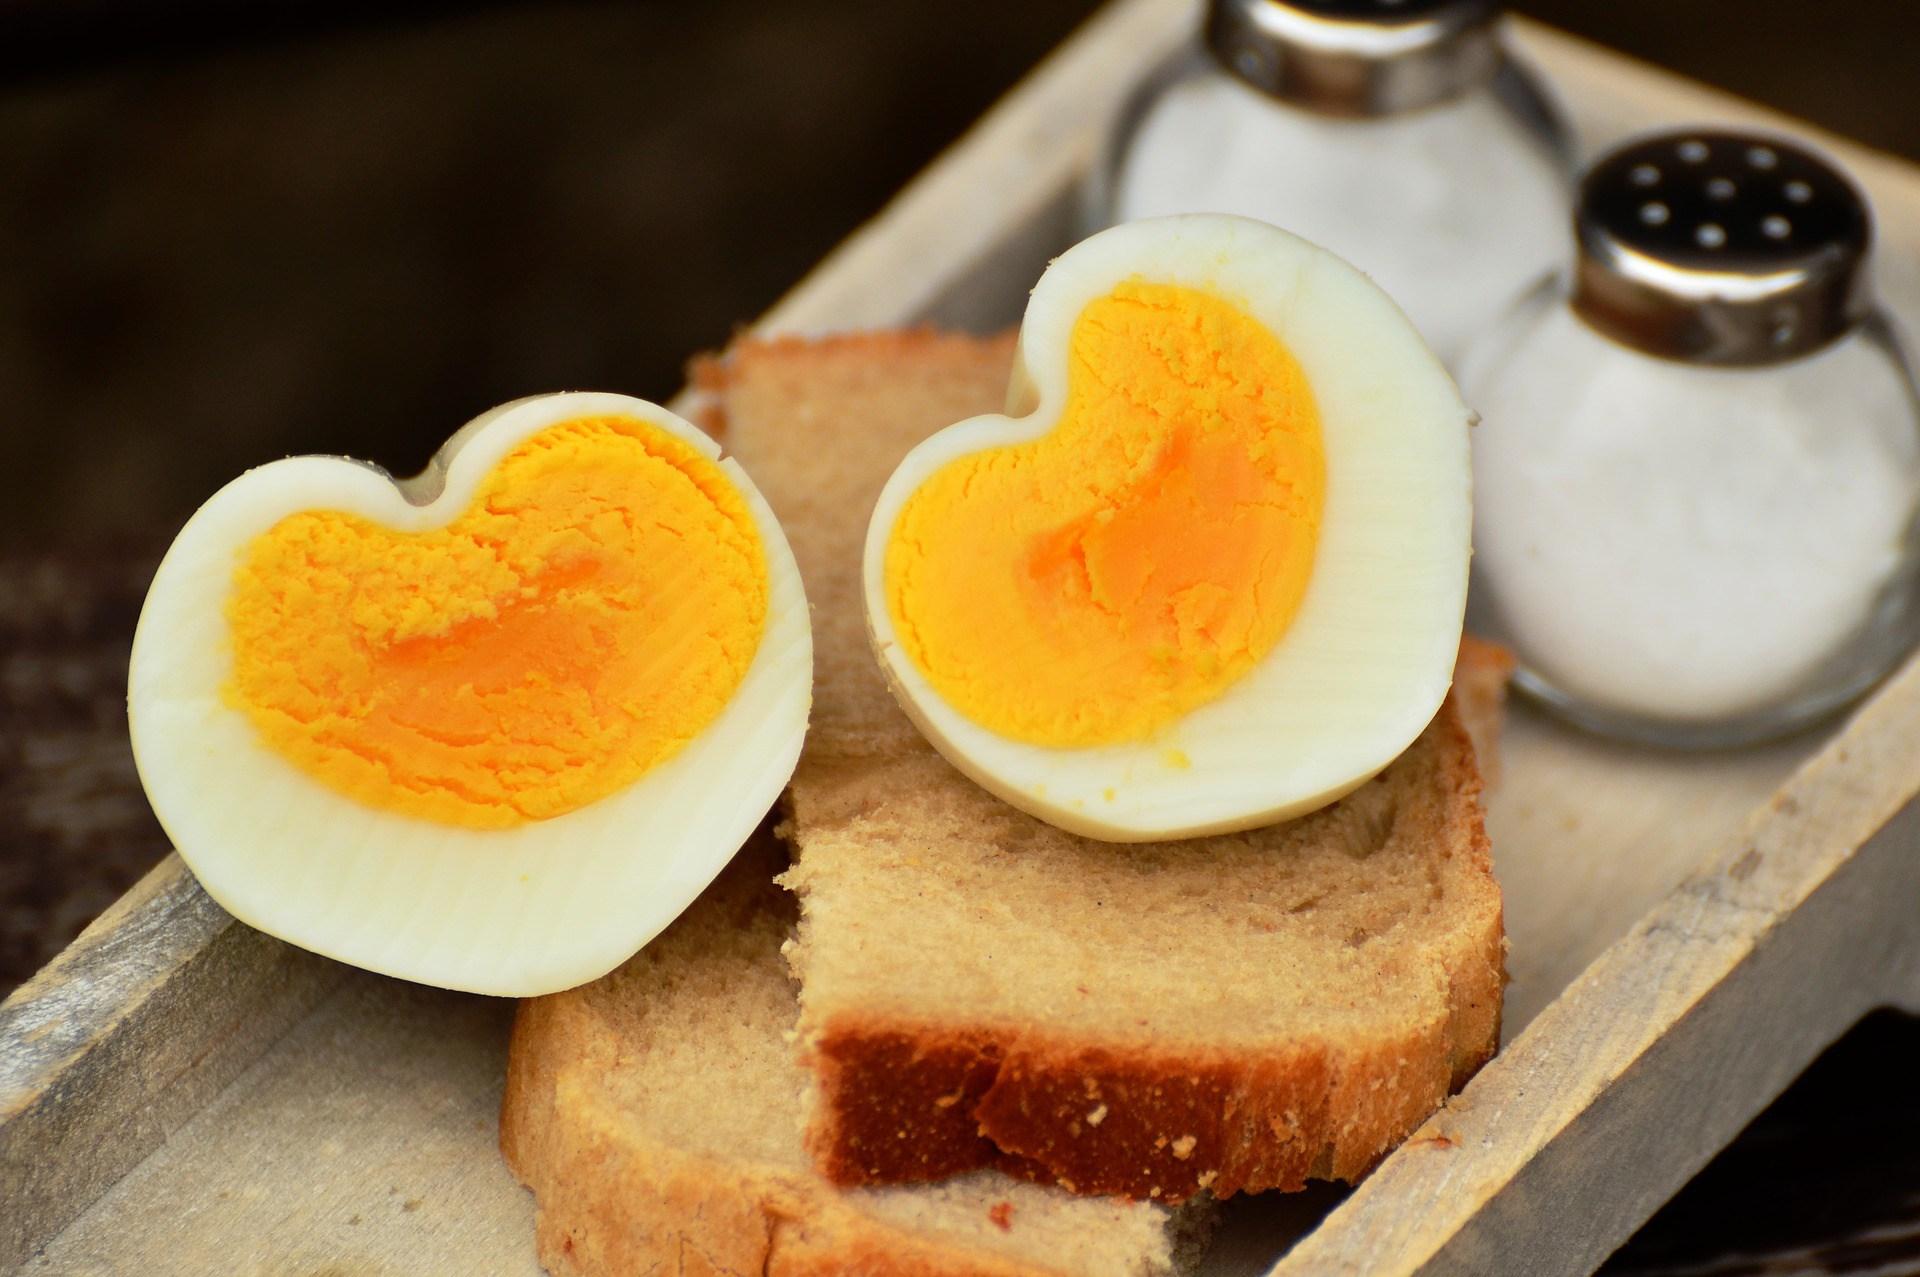 How to make heart shaped eggs - Life Hacks